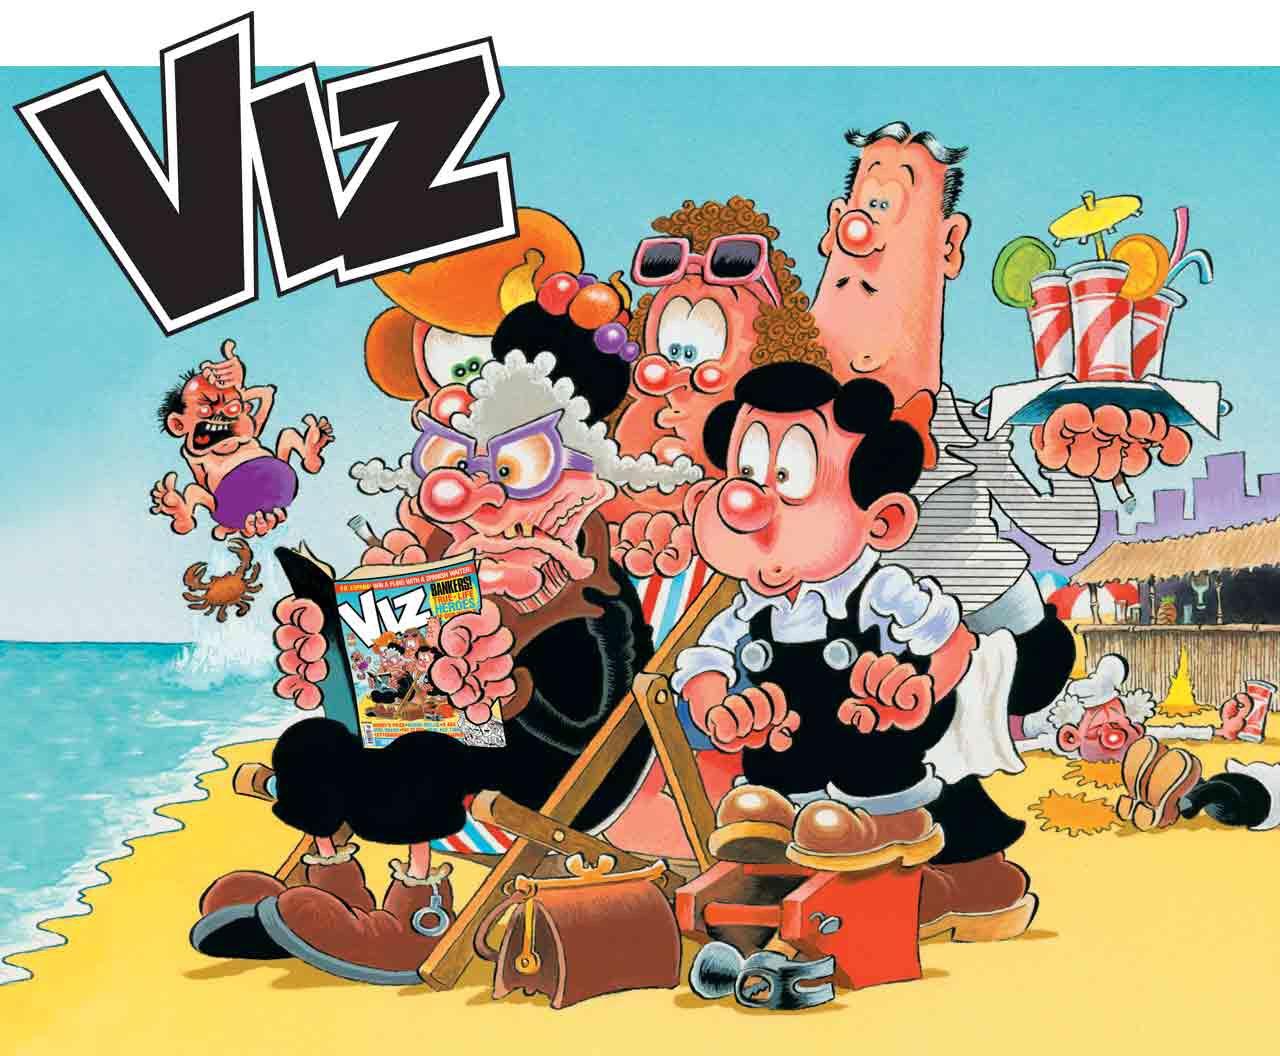 VIZ Promotional Art